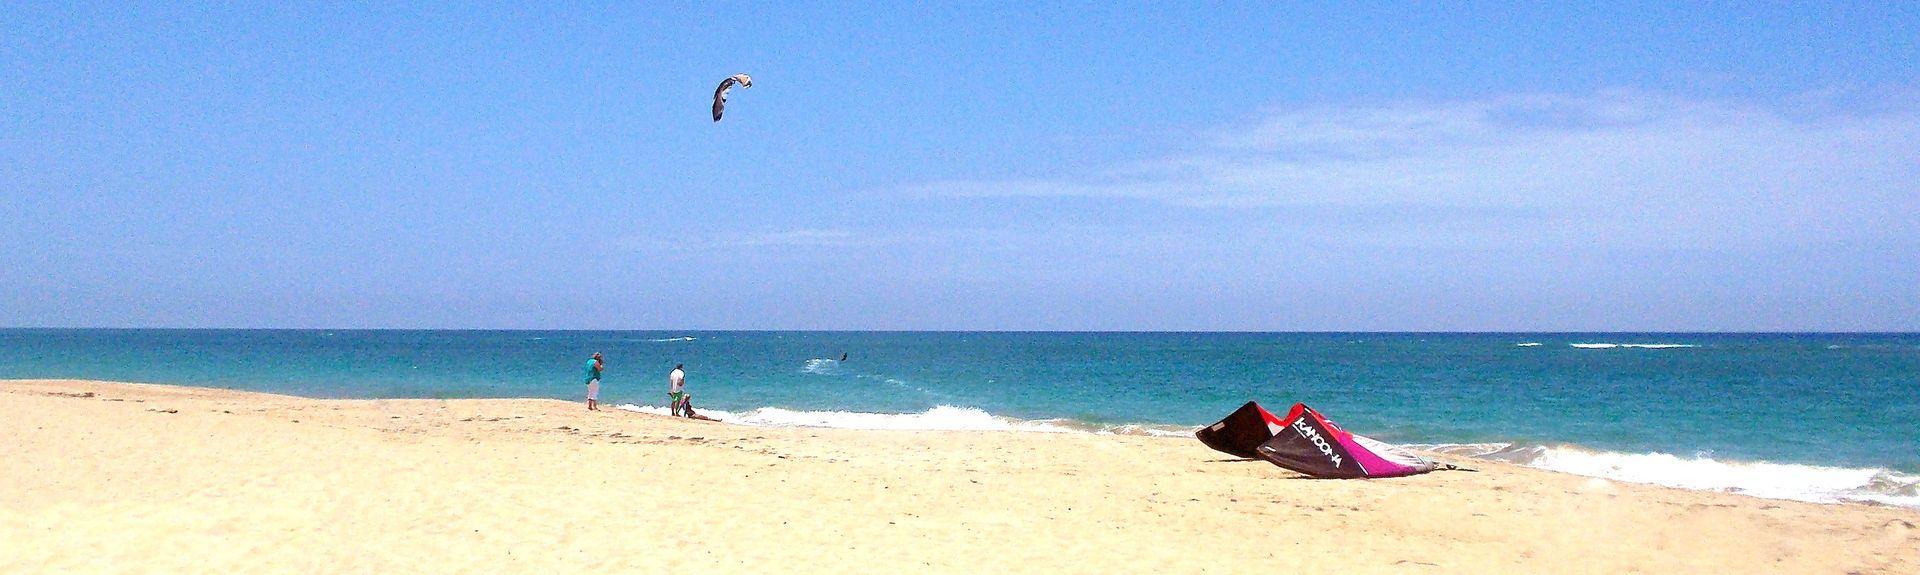 Kite Beach Hotel (Cabarete, Puerto Plata, República Dominicana)